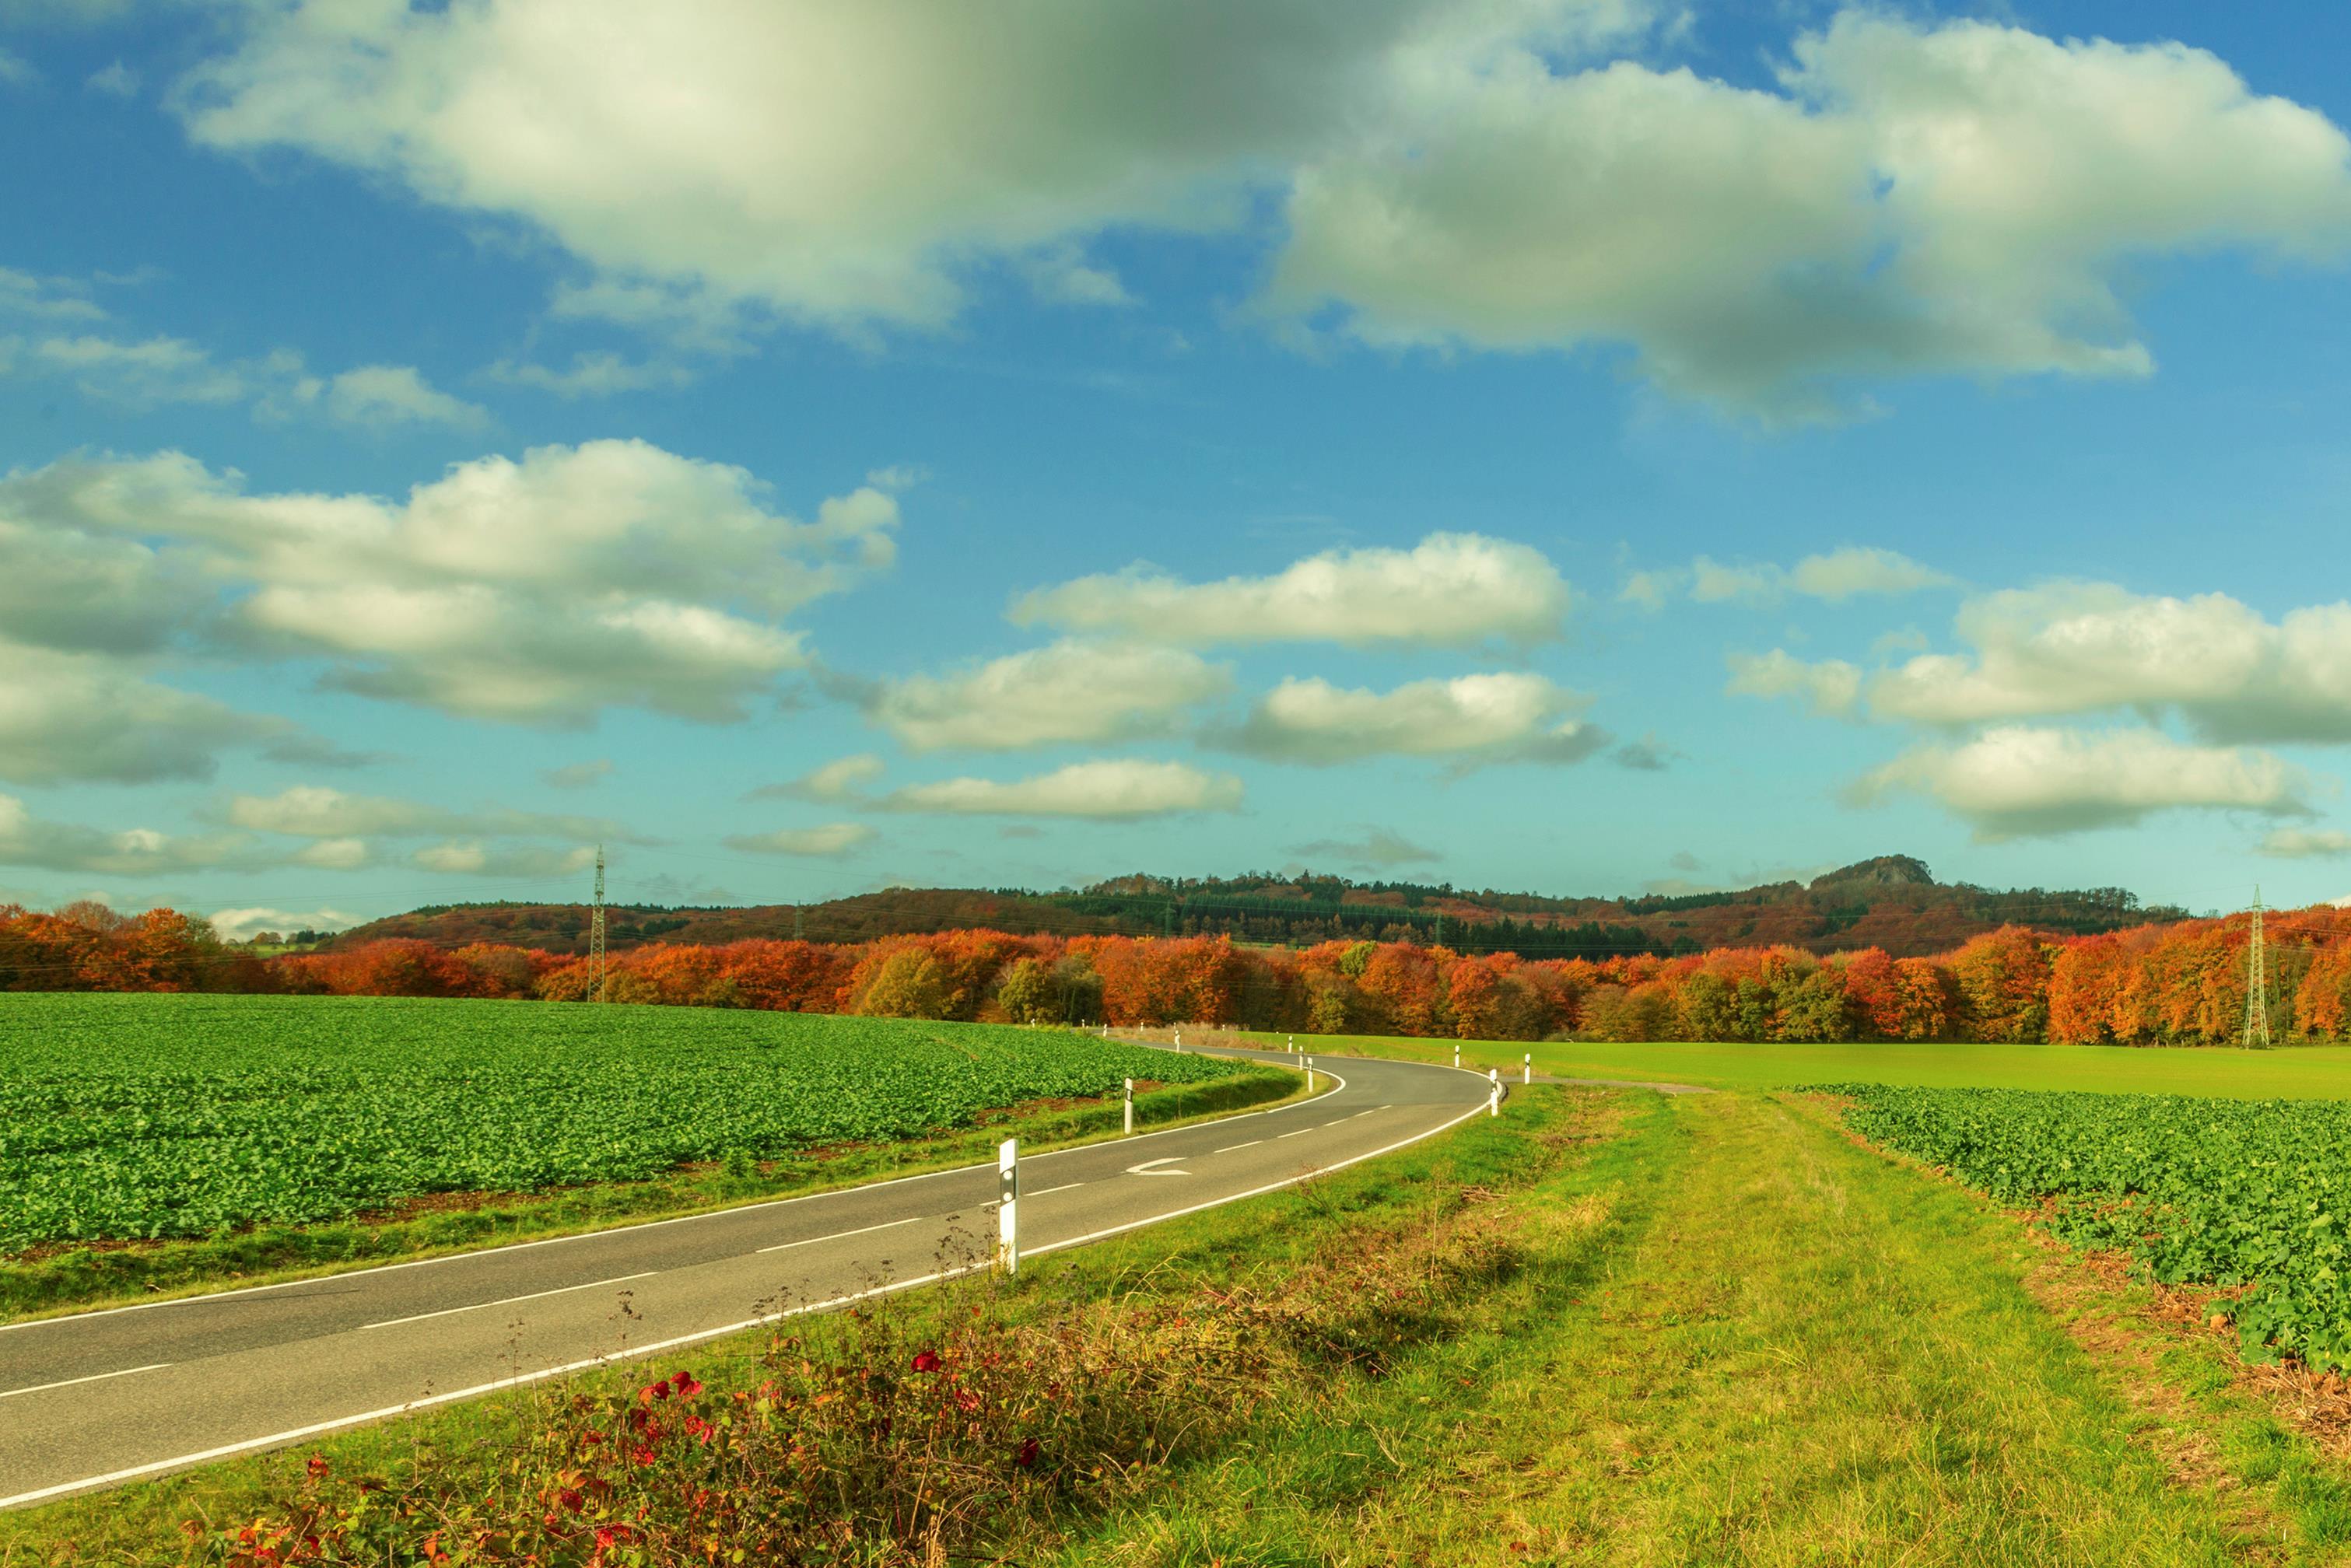 public://media/news/13._road_through_the_farm.jpg